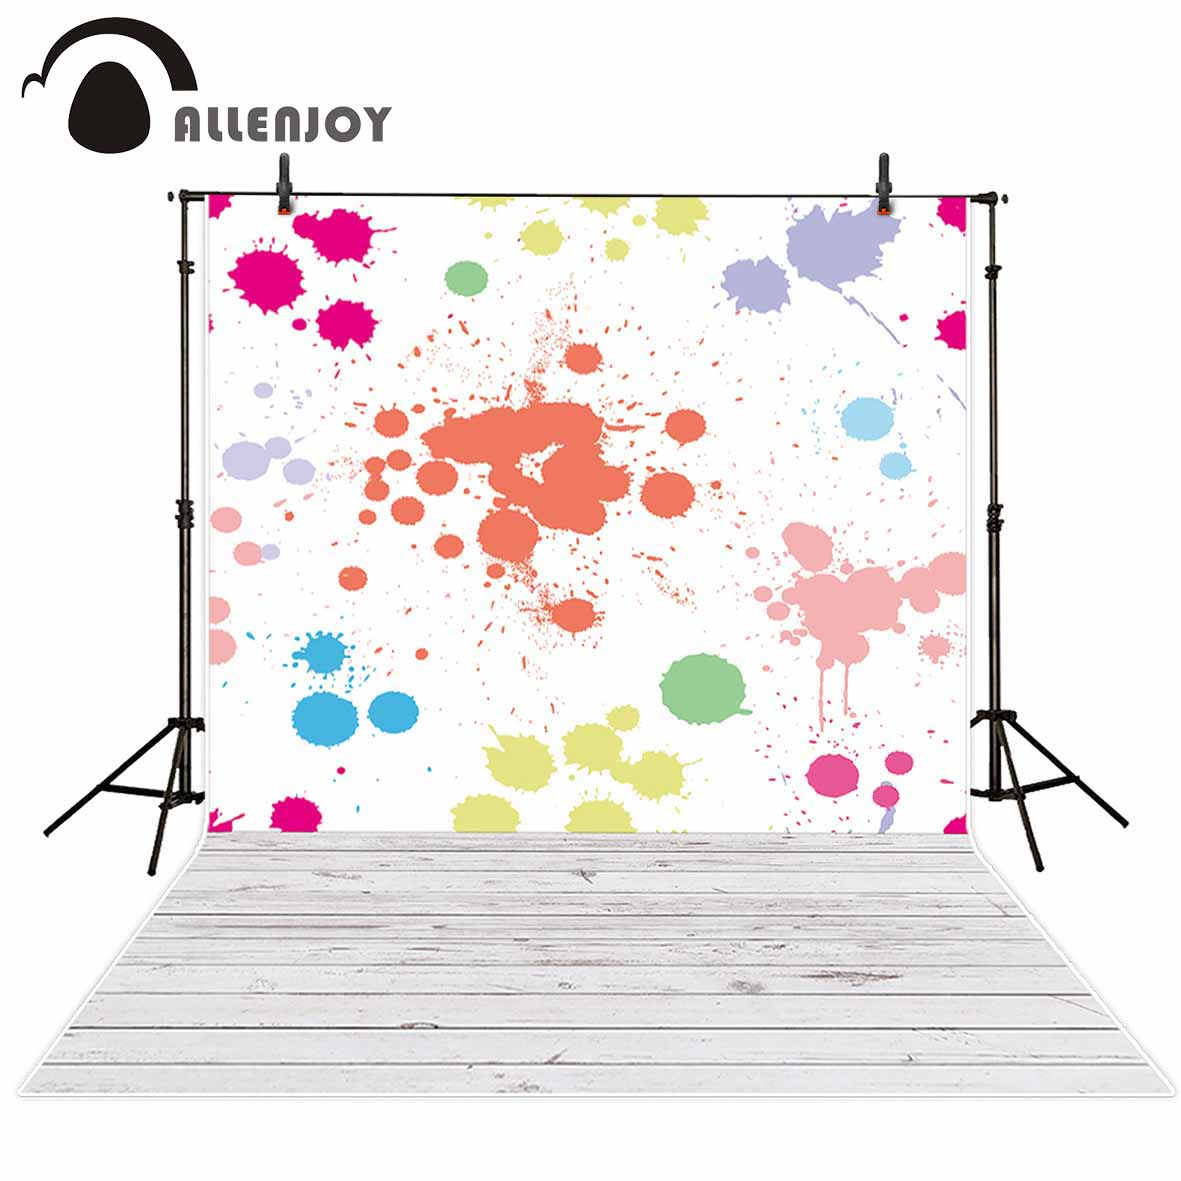 Allenjoy Fotografie Hintergrund Tinte Kreative Malerei Kinder Moderne Neuheiten Original Design Fr FotostudioChina